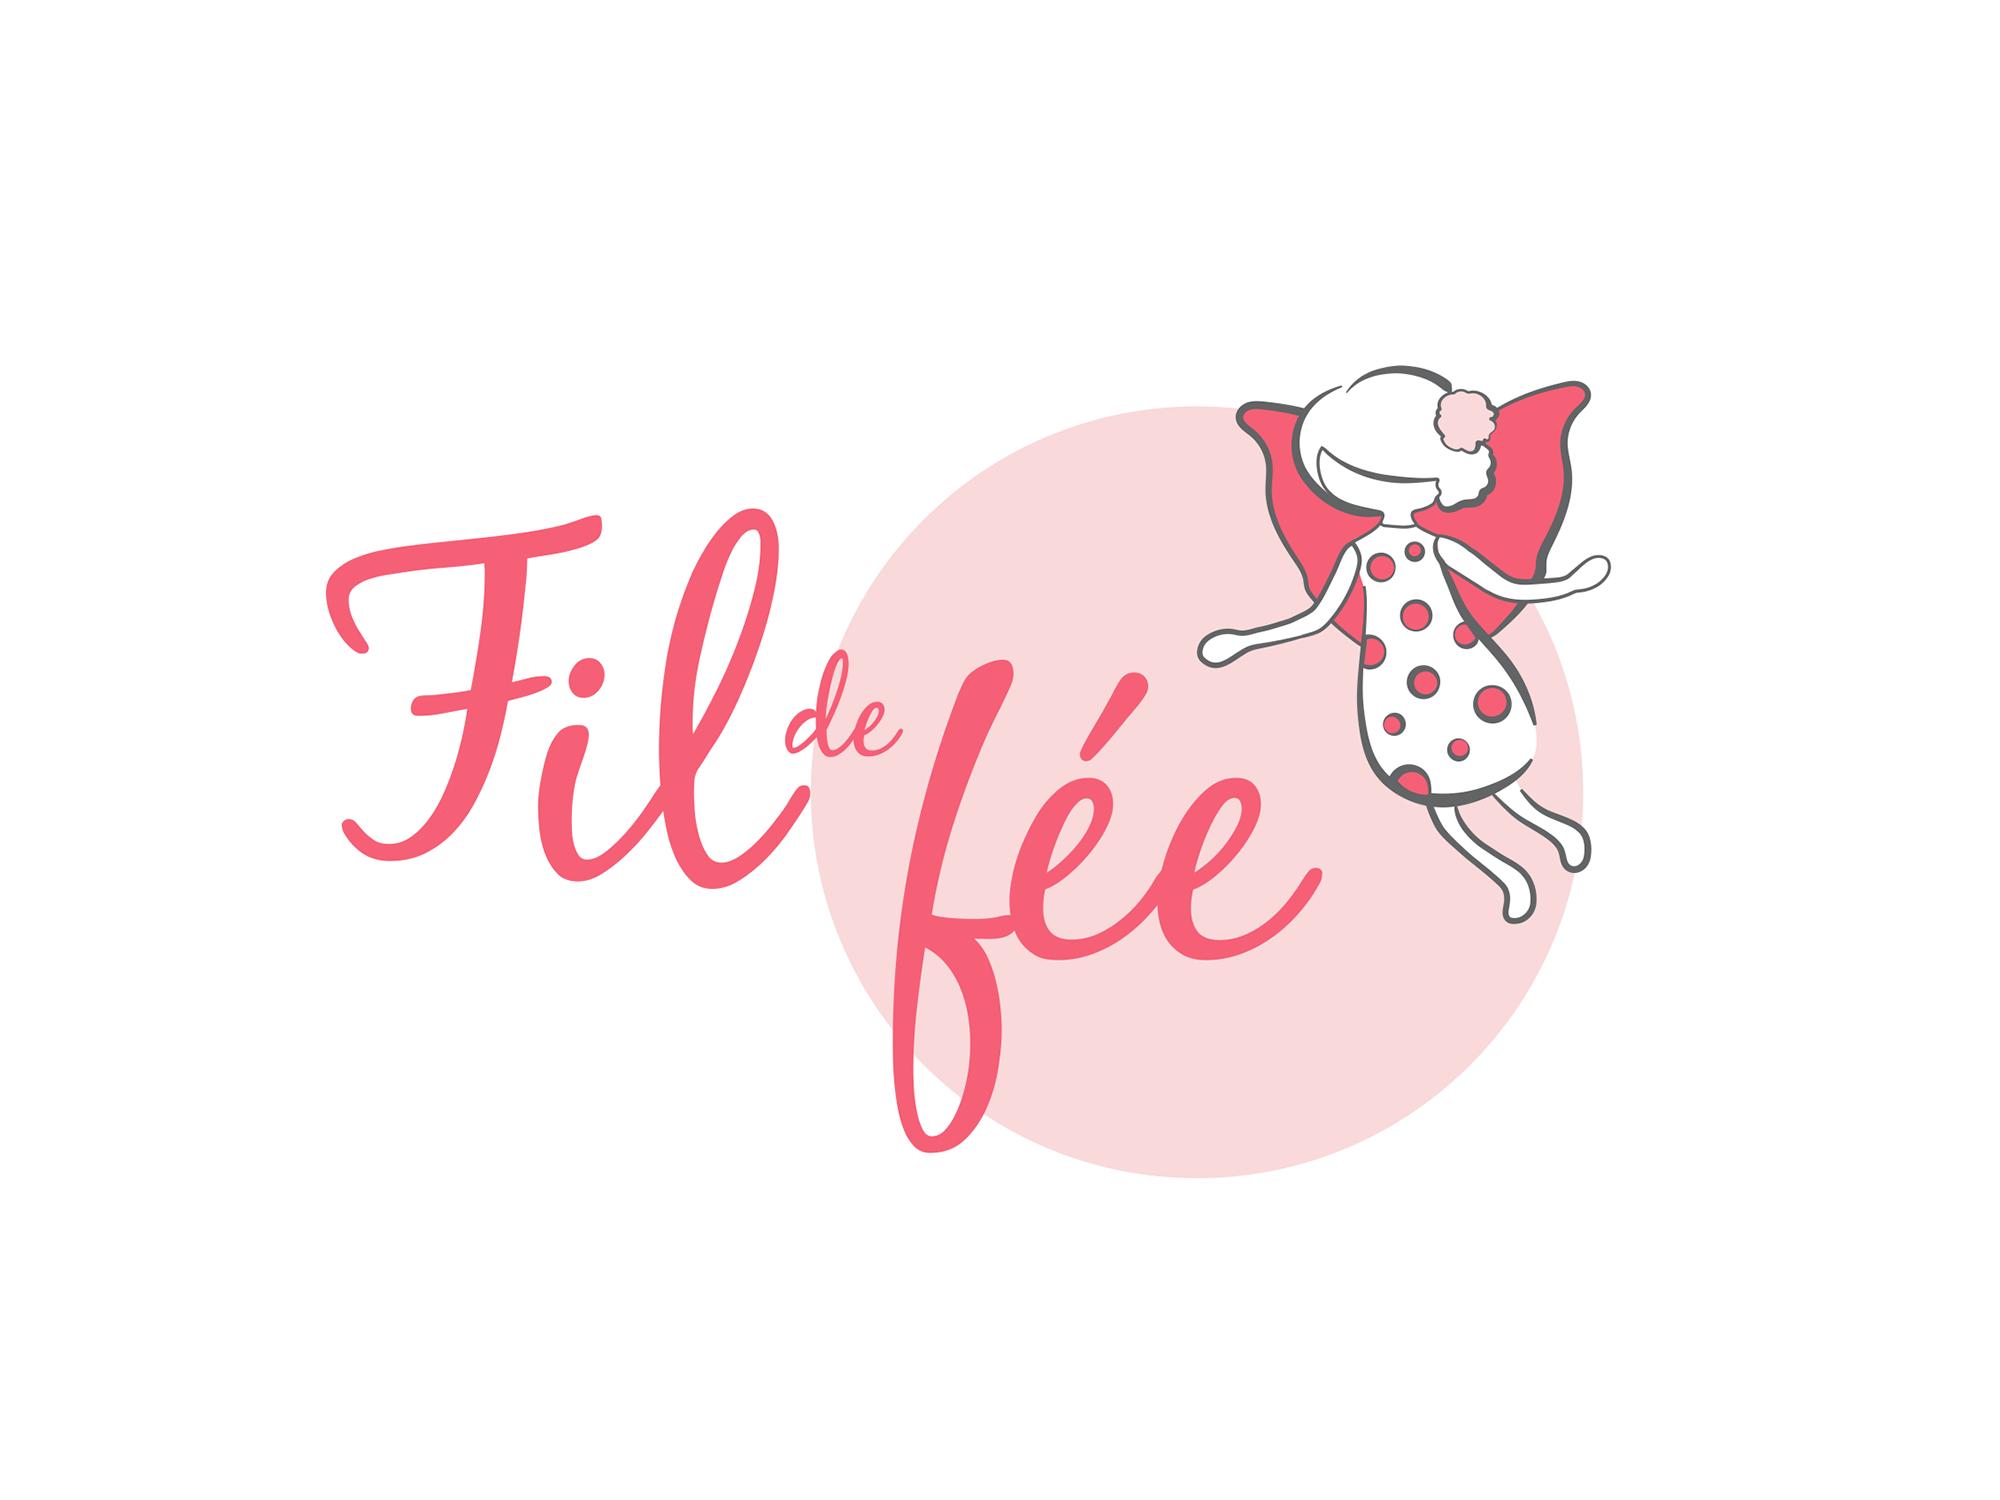 Logo Fil de fée